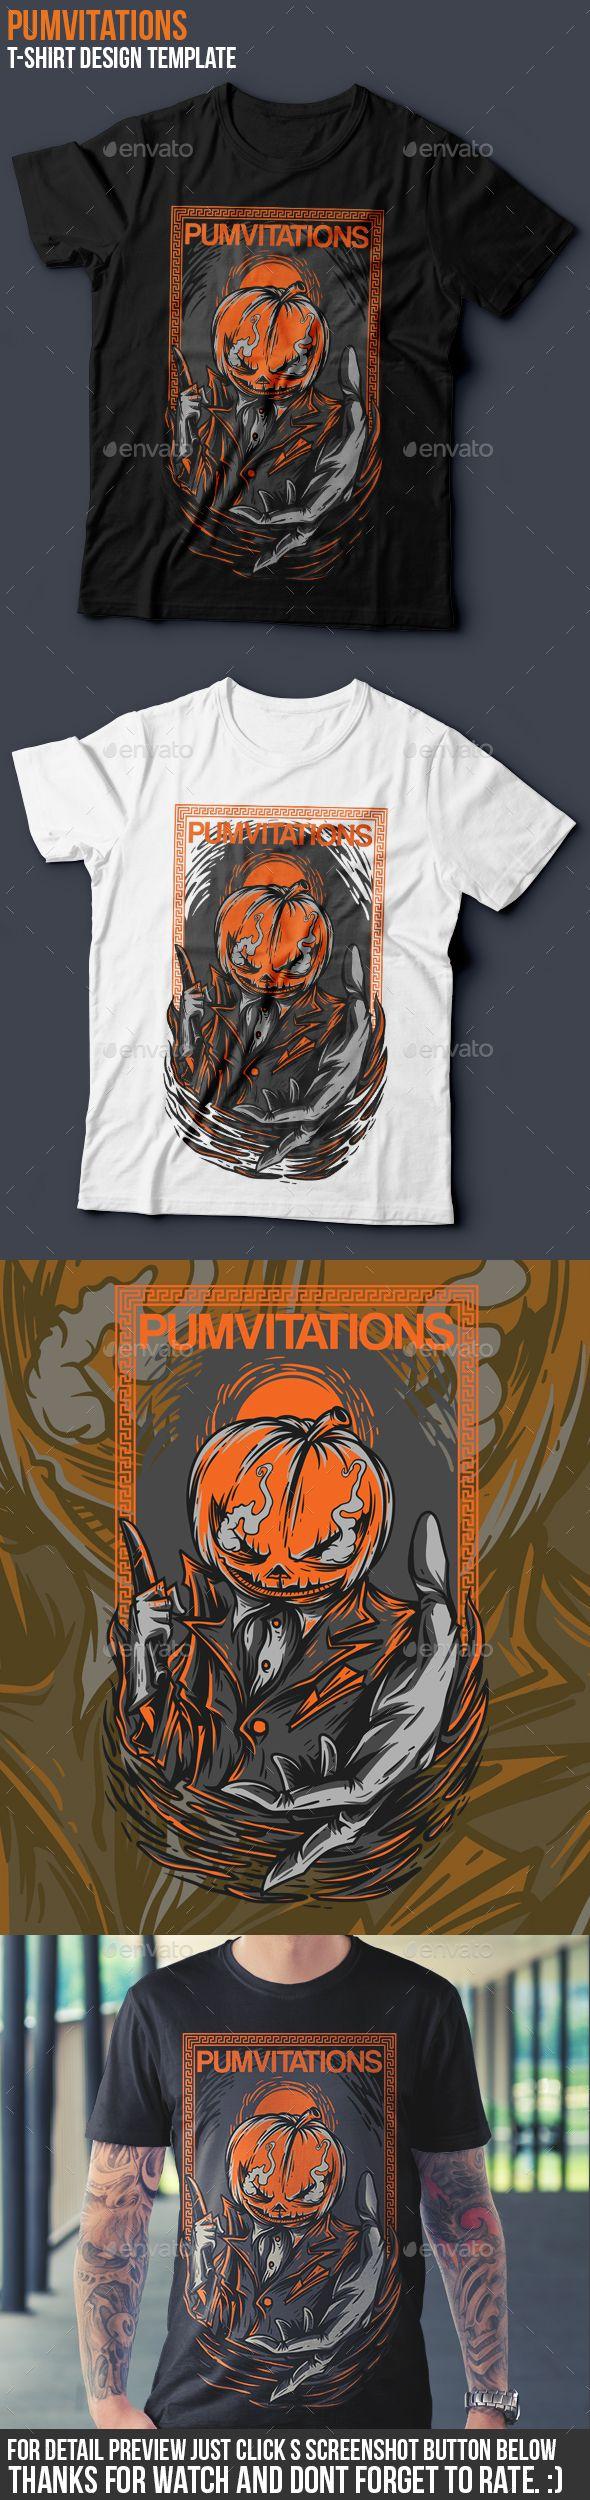 Shirt design eps - Pumvitations T Shirt Design